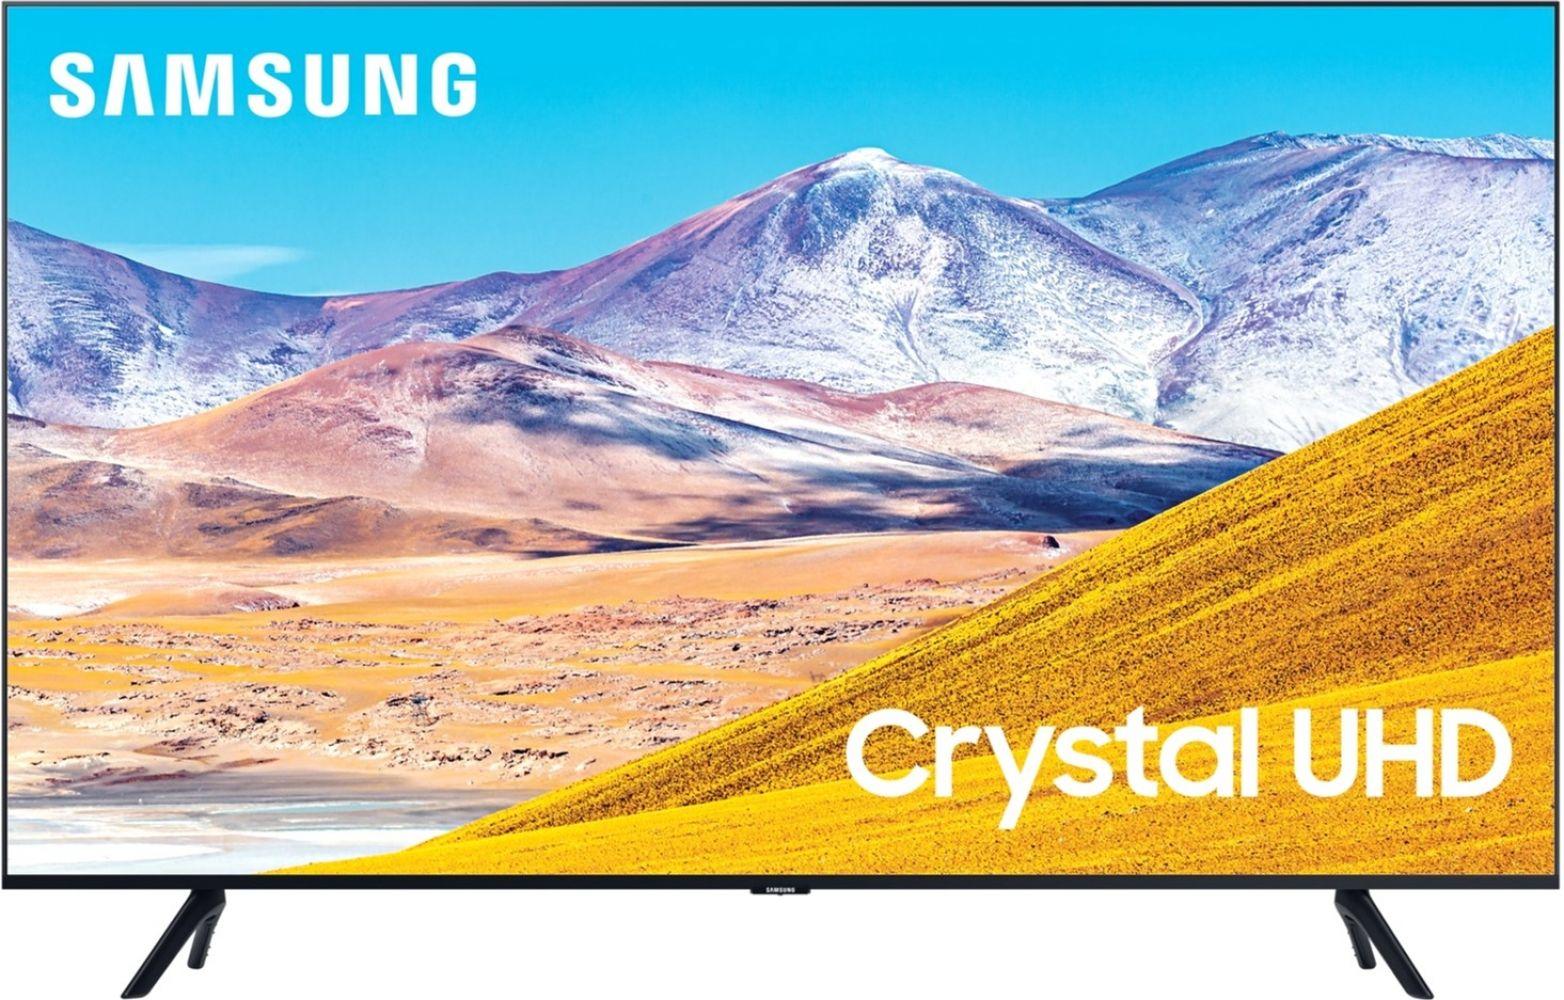 Купить Телевизоры, Телевизор SAMSUNG UE43TU8000UXUA